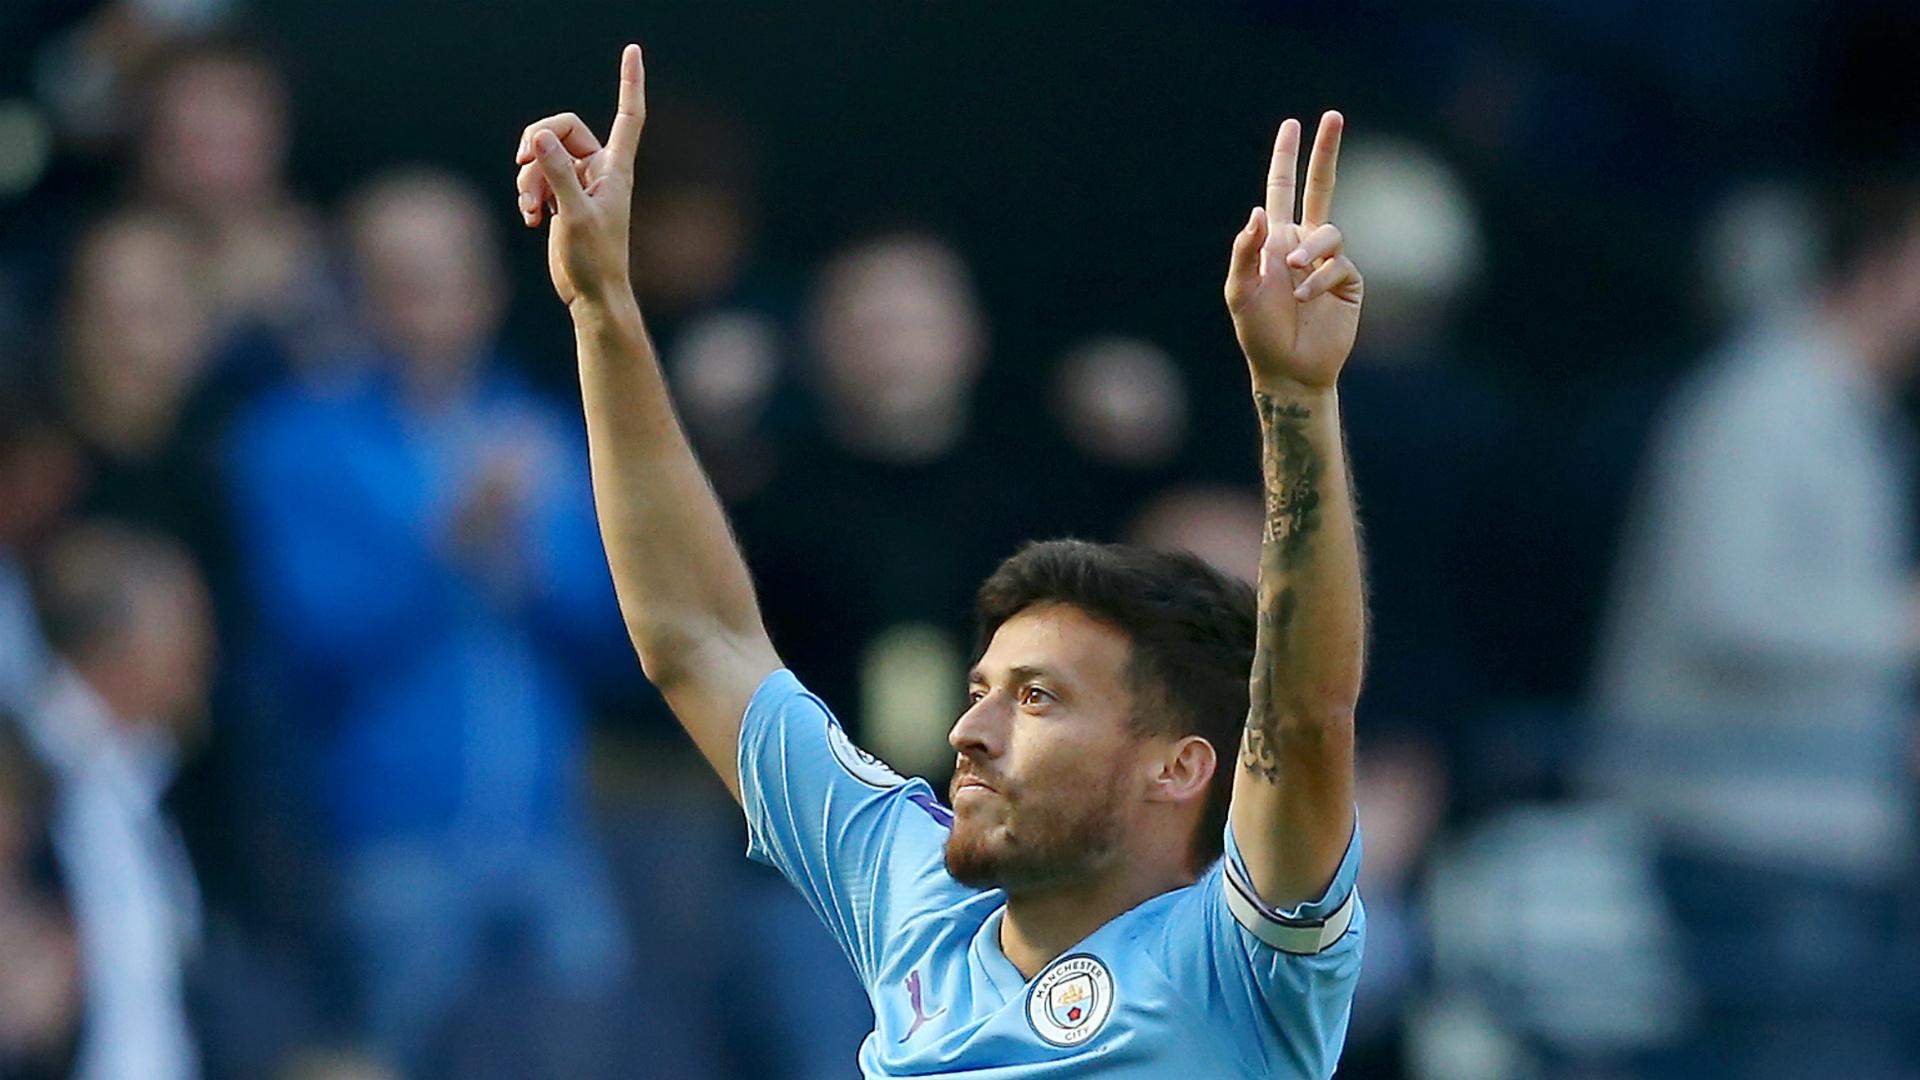 Manchester City sets club top-flight record with 8-0 Watford thrashing